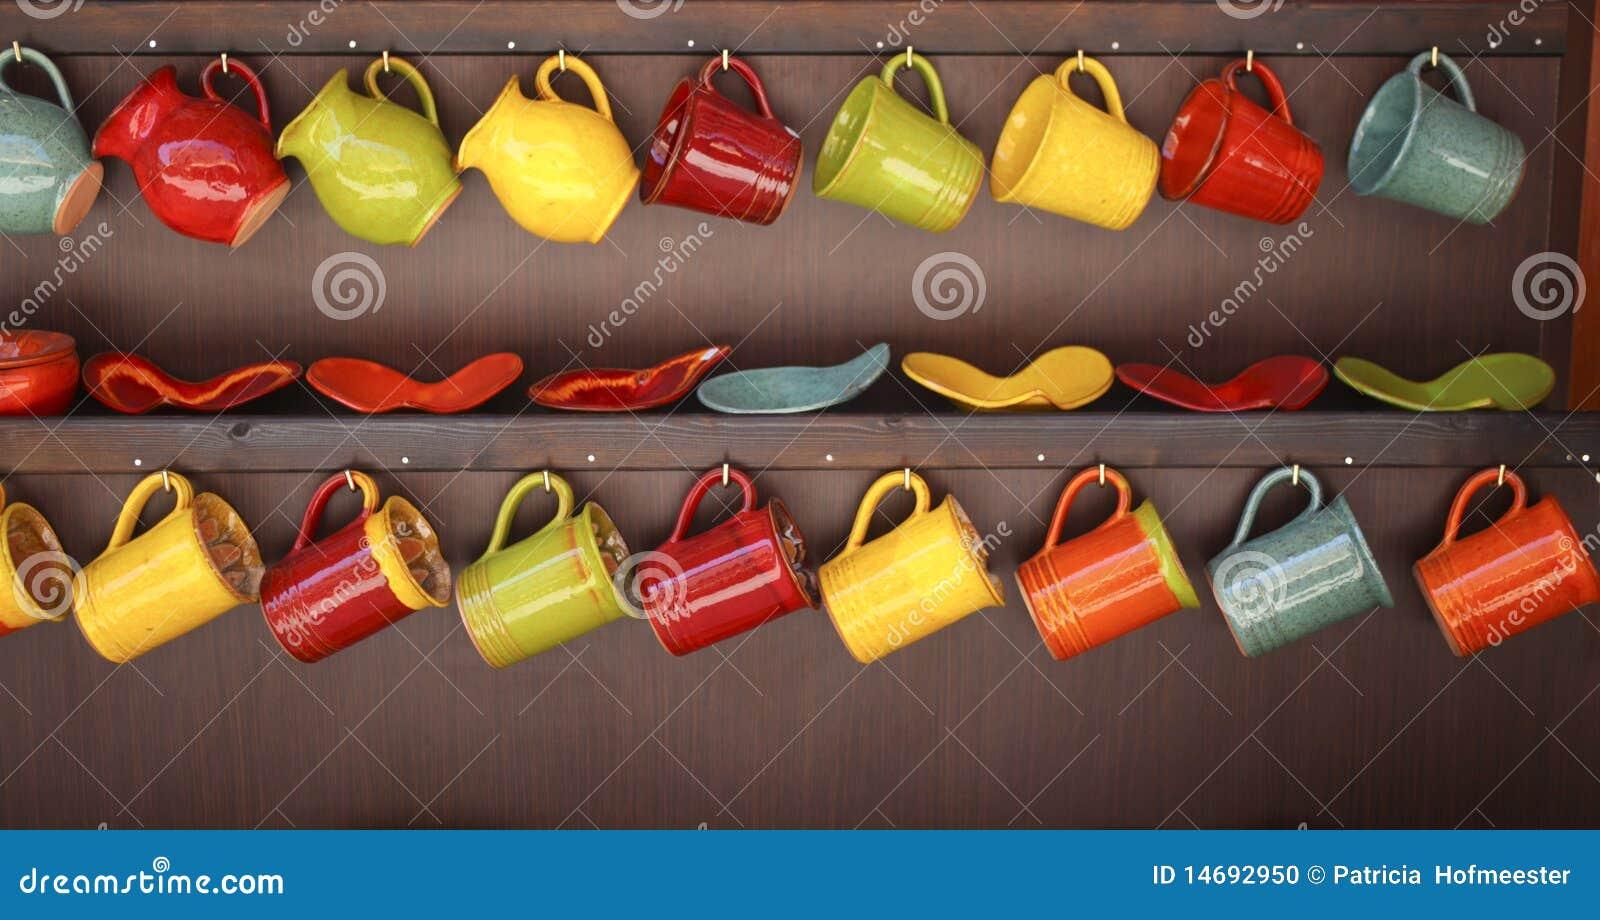 row of colorful mugs - Colorful Mugs